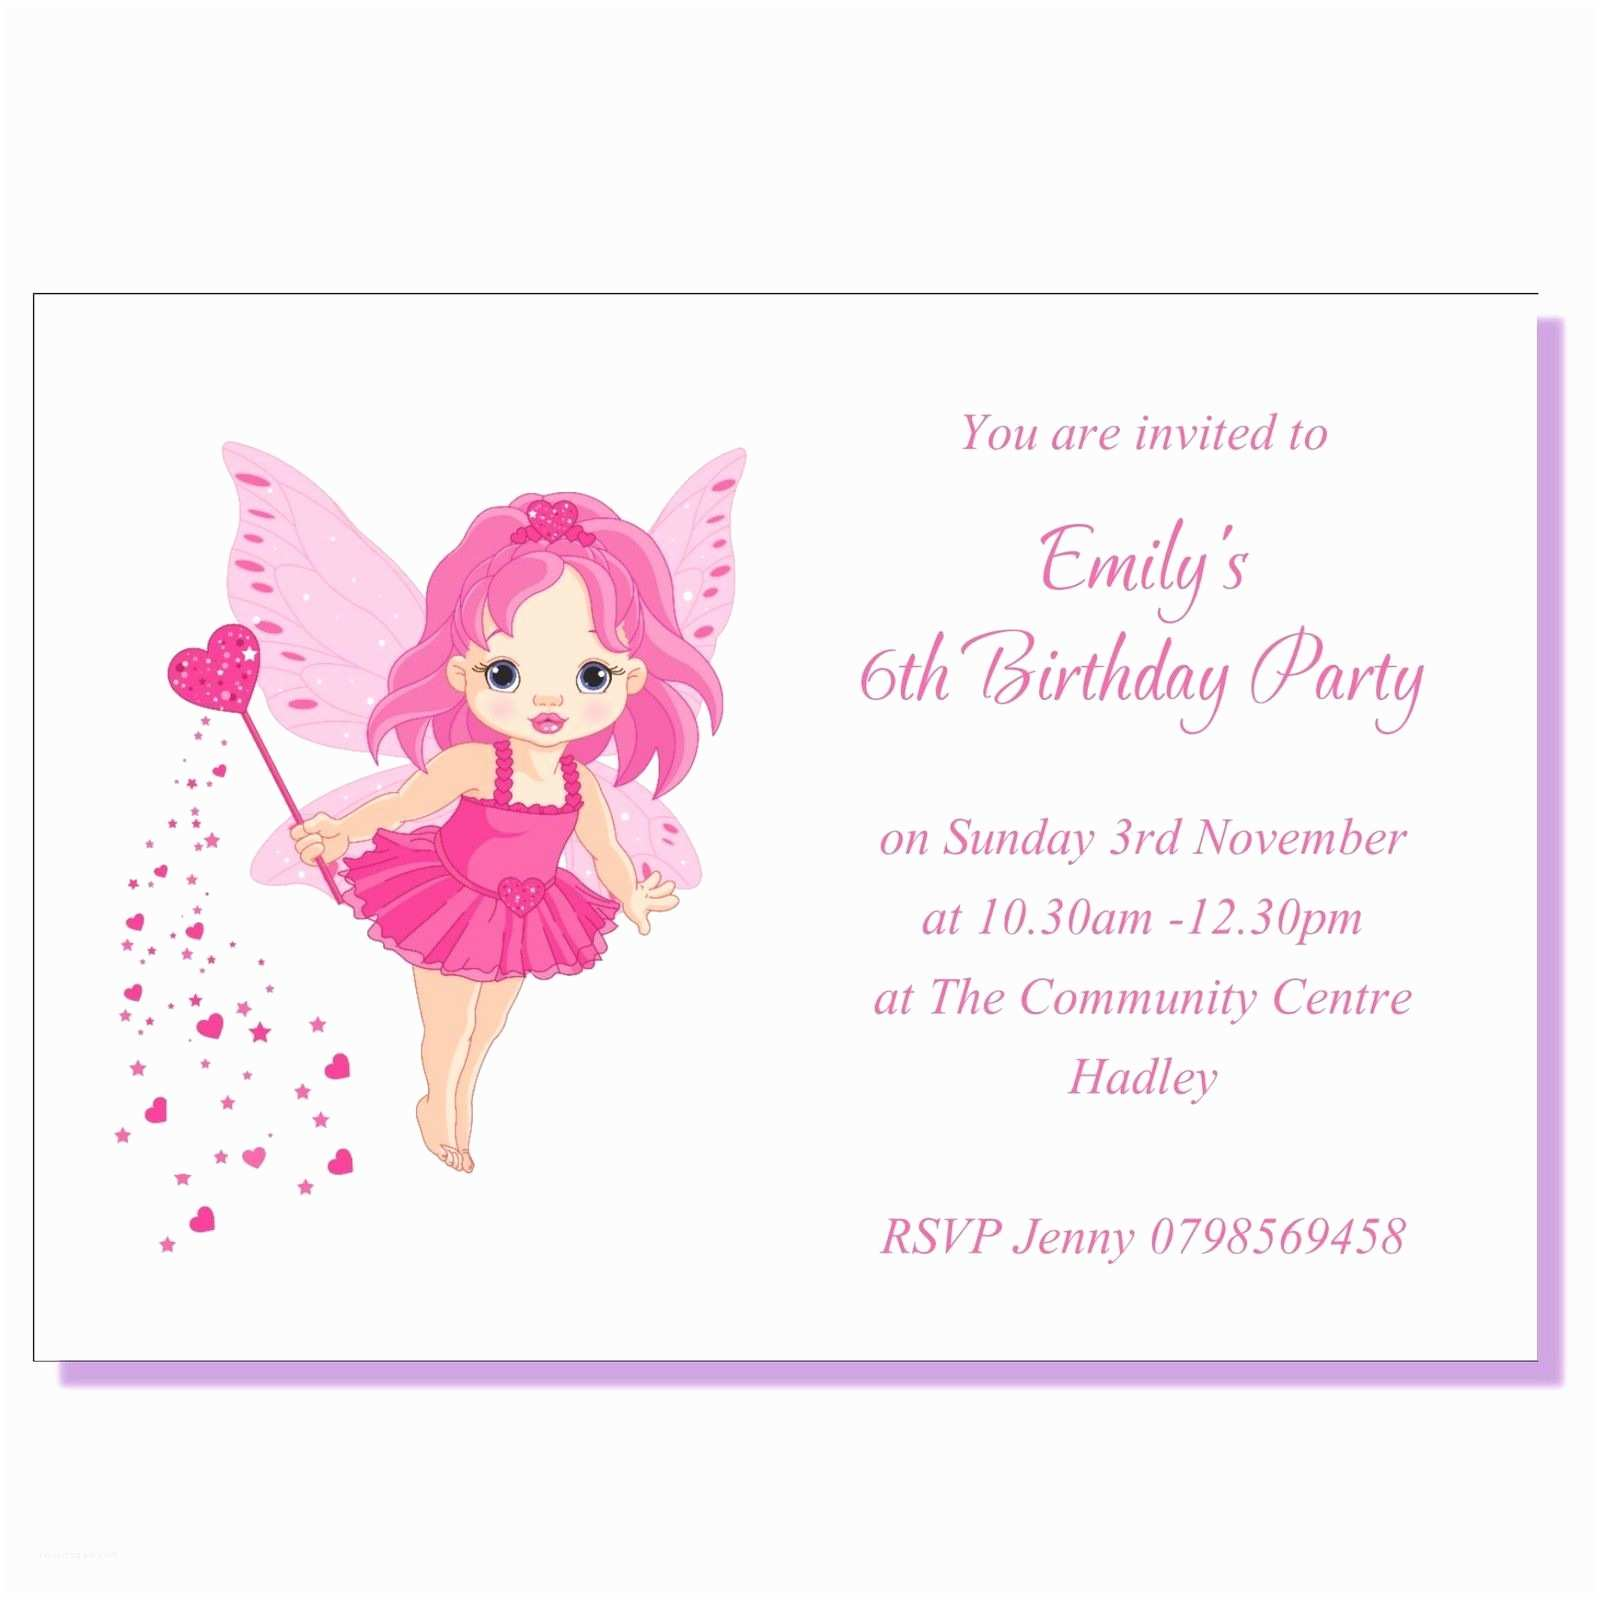 Kids Birthday Party Invitation Wording Childrens Birthday Party Invites Children S Birthday